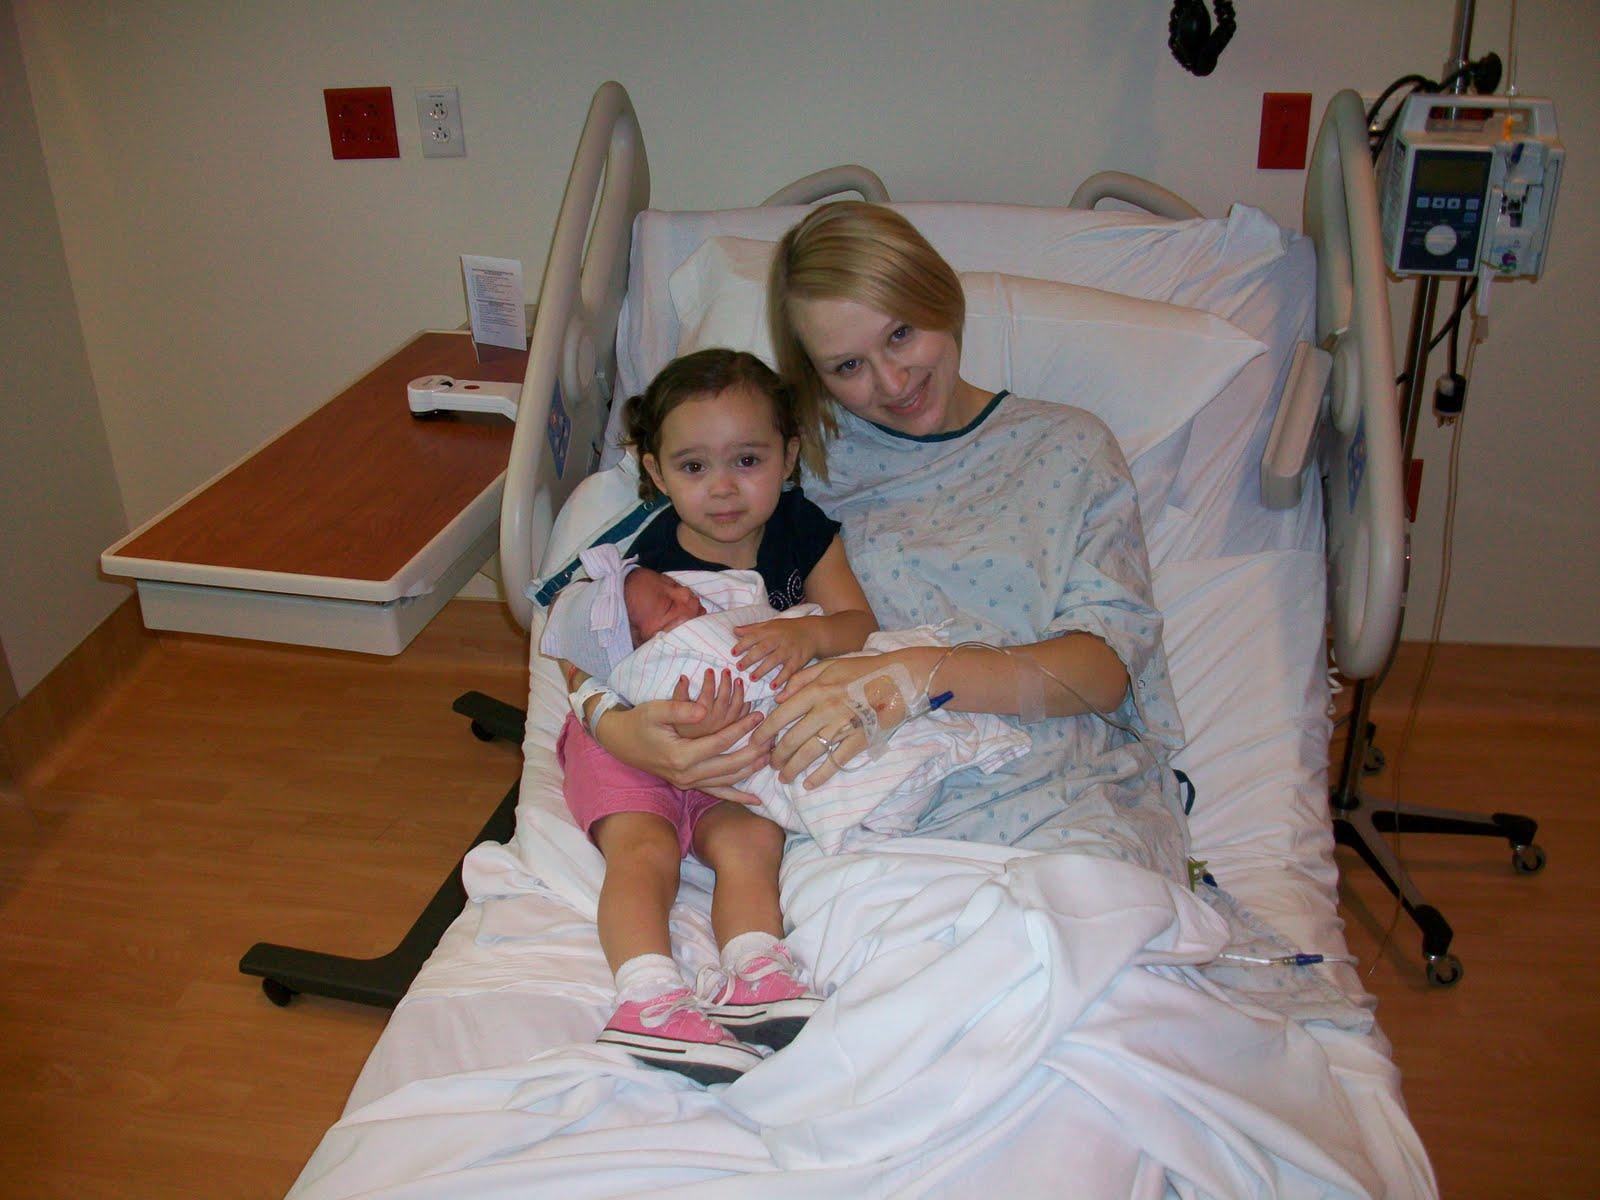 imgsrc.ru daddy She met her big sister. (I did not put those dorky looking socks on Alana!)